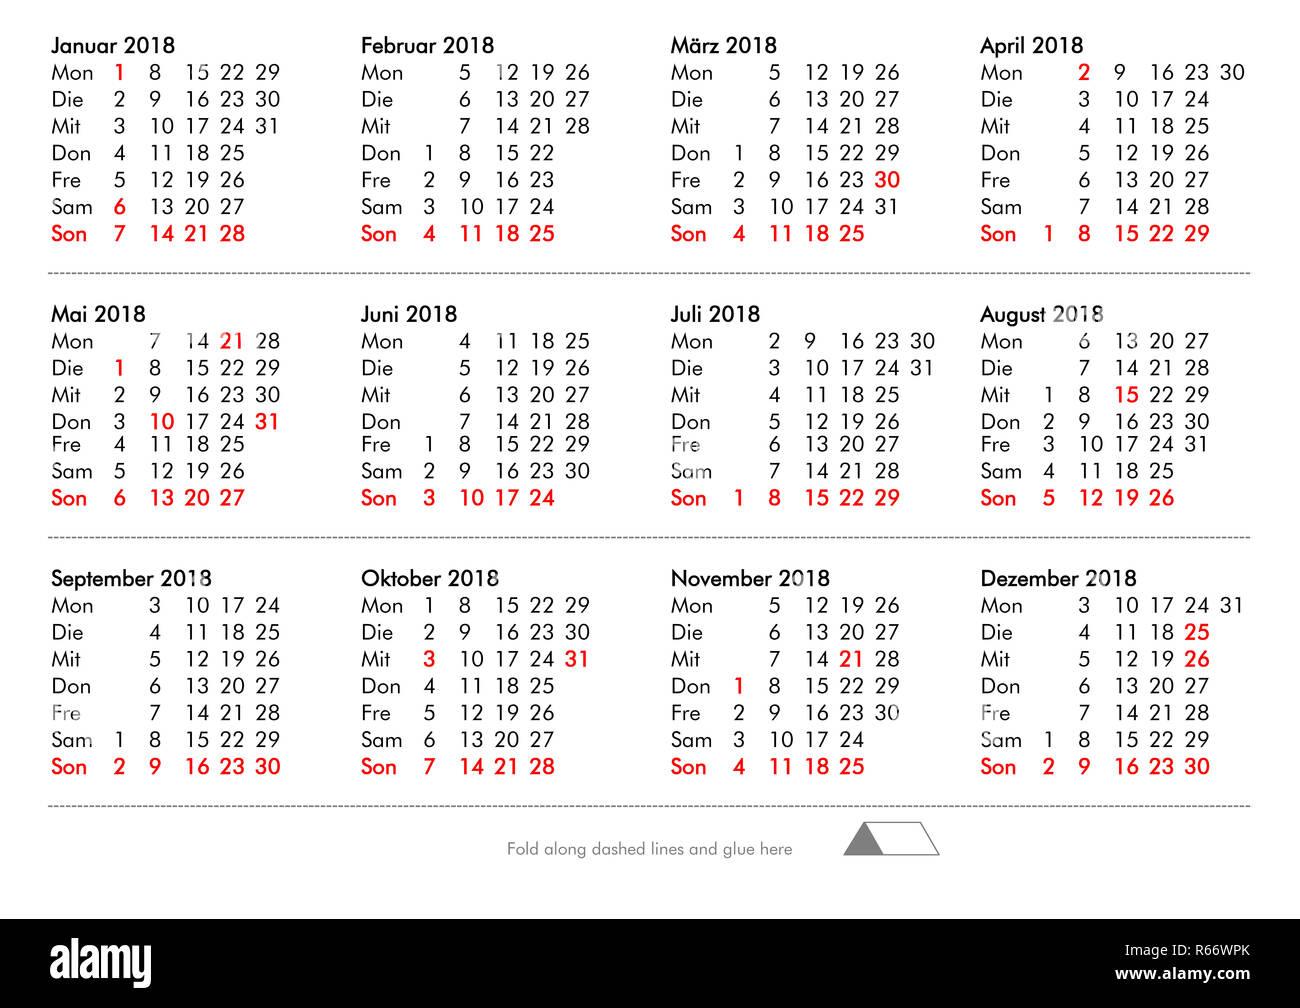 Diy Fold And Glue Year 2018 Calendar Germany Stock Photo